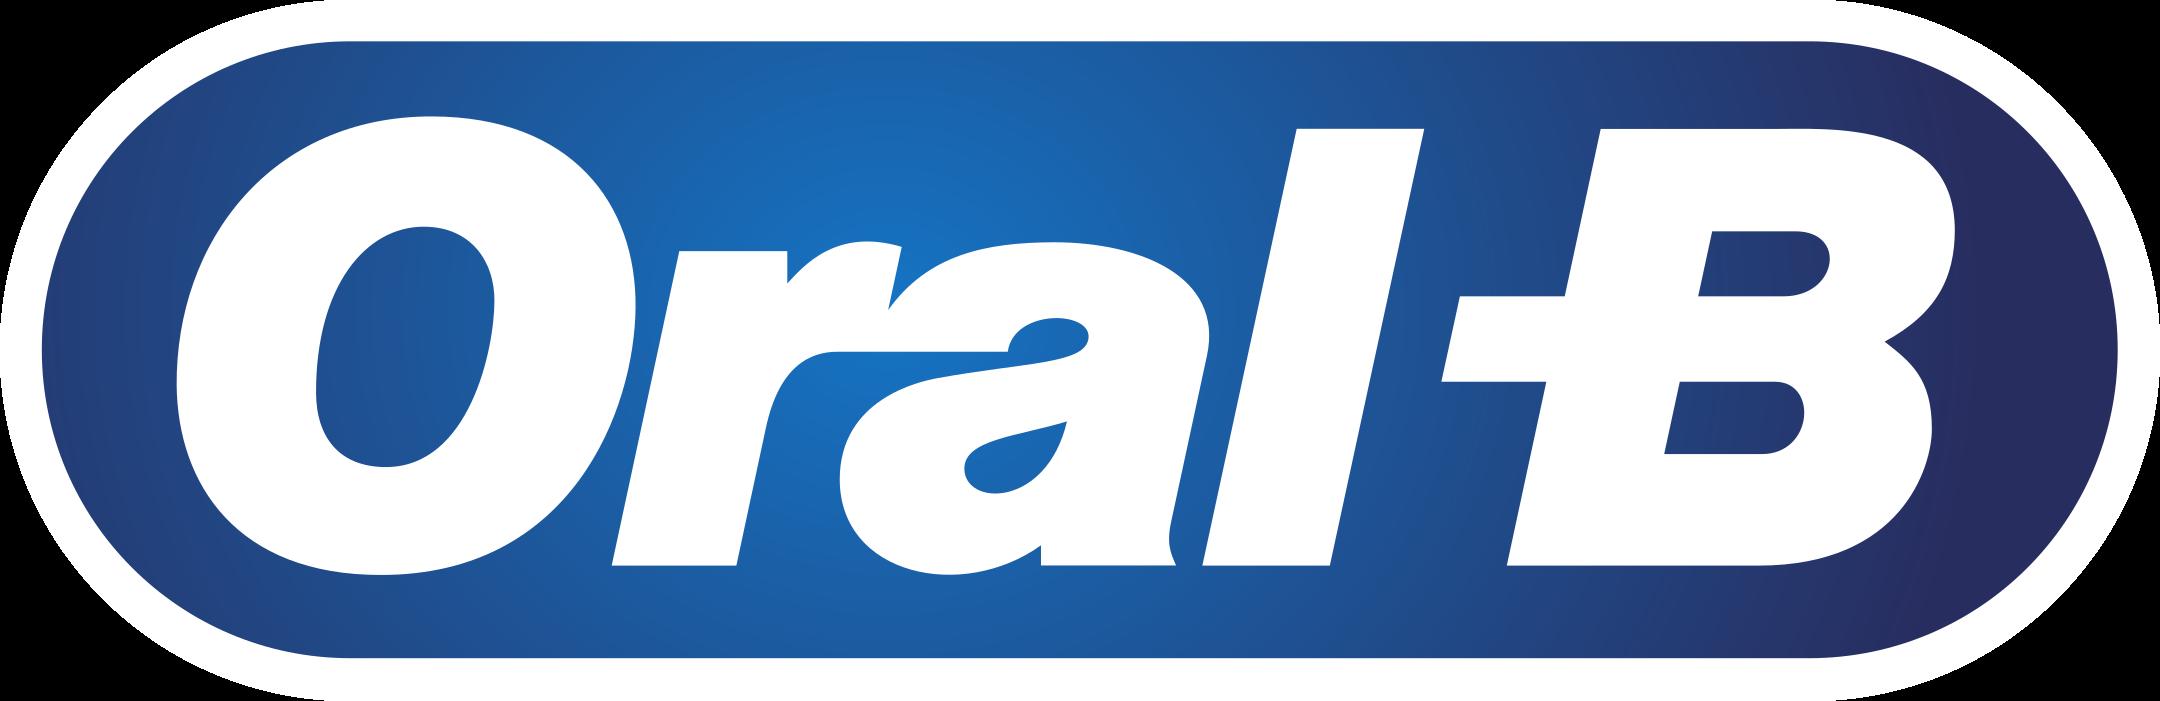 oral b logo 1 1 - Oral-B Logo